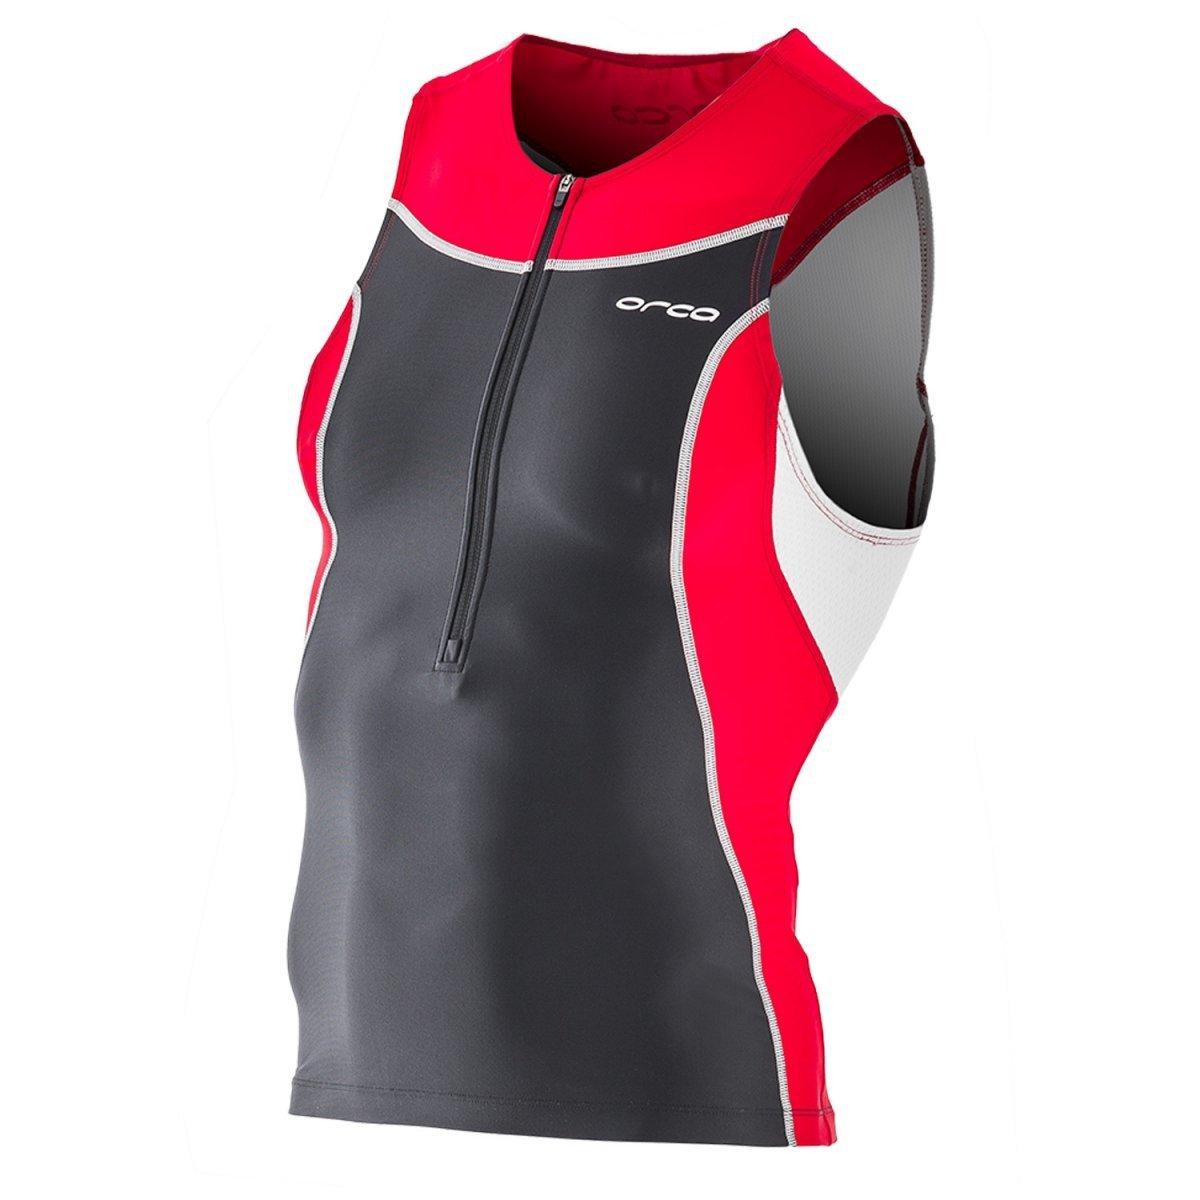 6555caa937cf4a ORCA CORE koszulka triathlonowa męska - męskie - Koszulki - Odzież ...